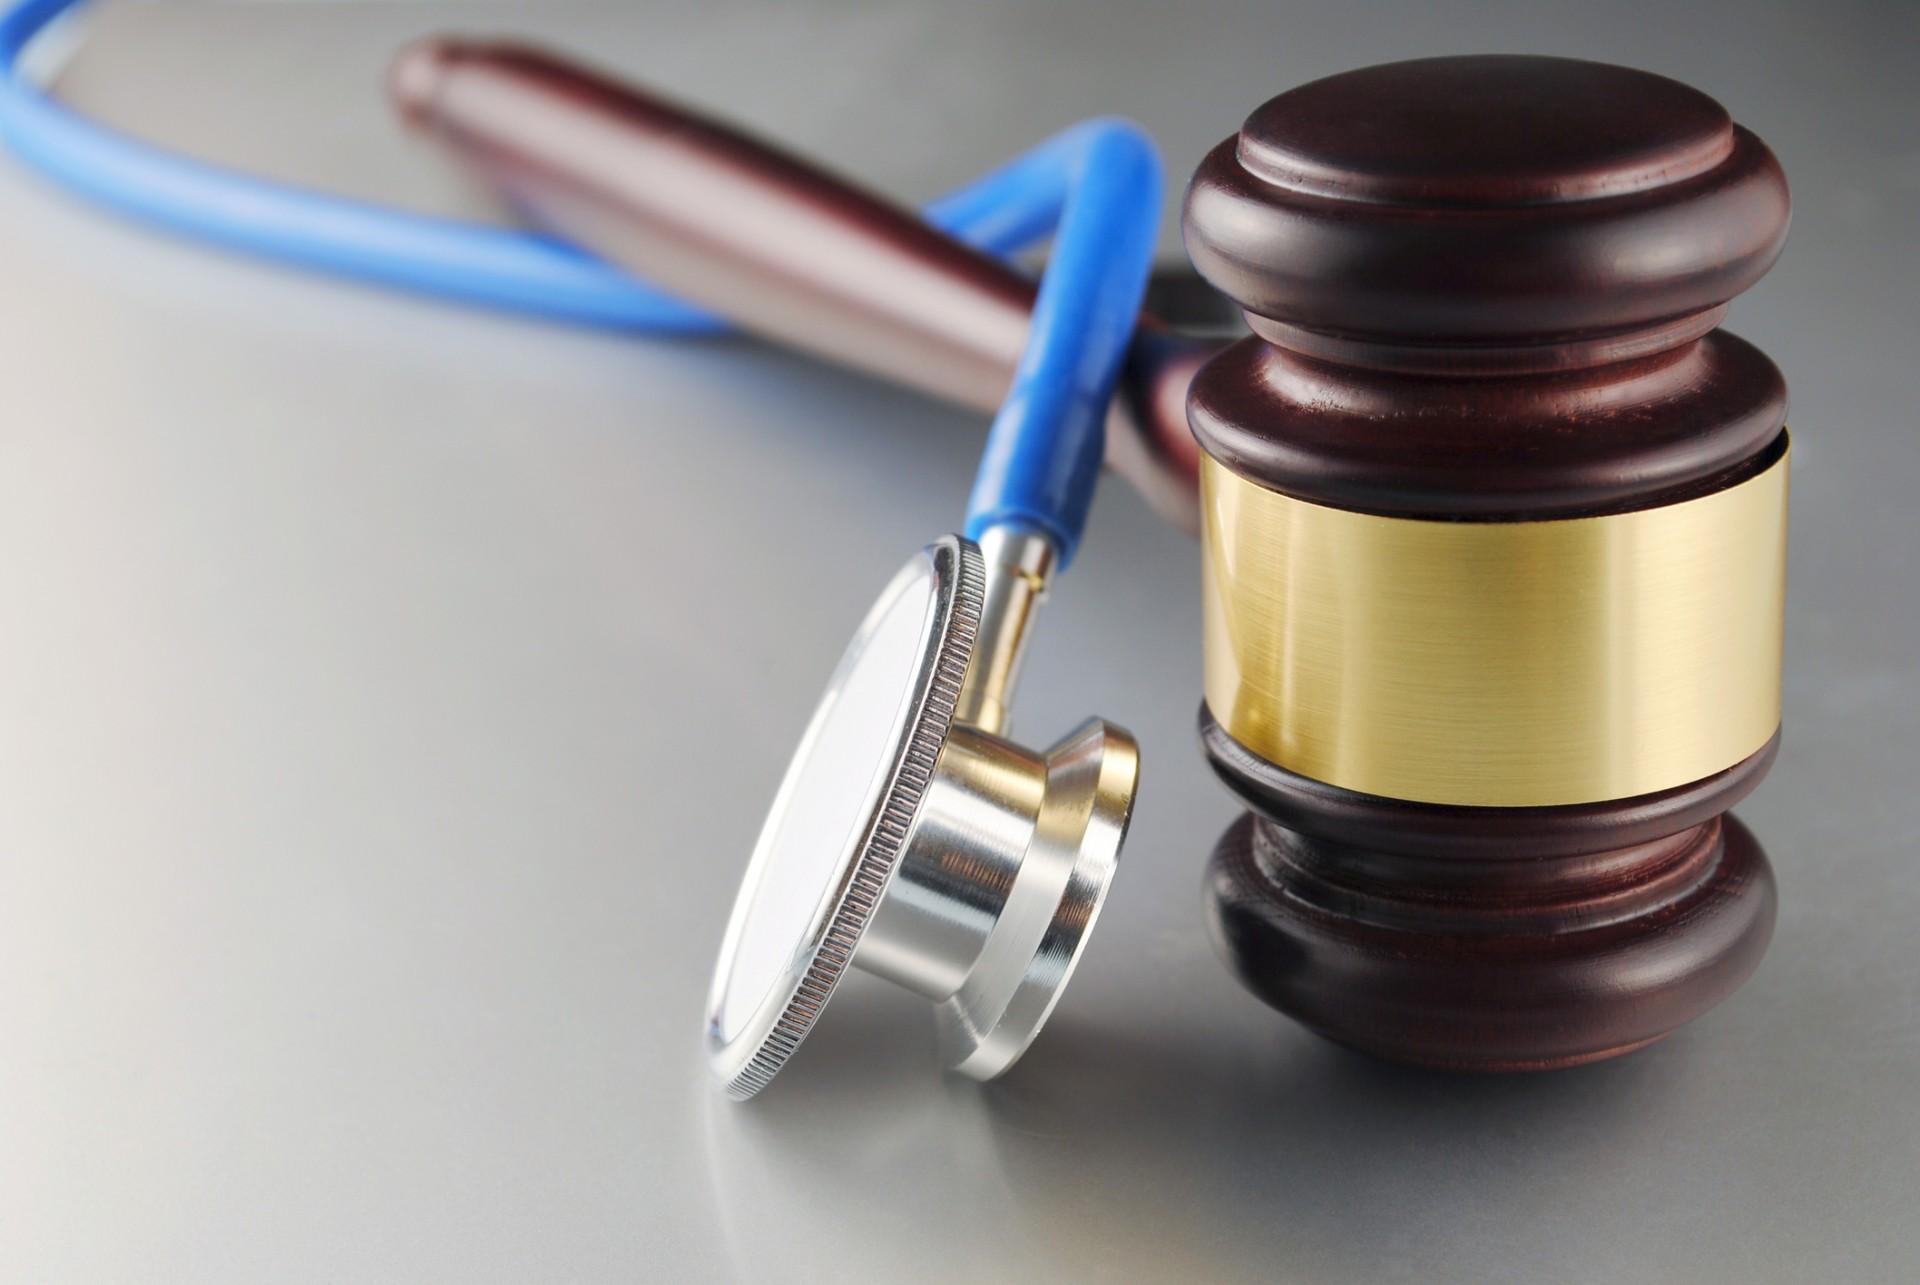 Healthcare Fraud: Elva Acevedo Santos Sentenced In a Scheme to Defraud Texas Medicaid Through Fraudulent Billings